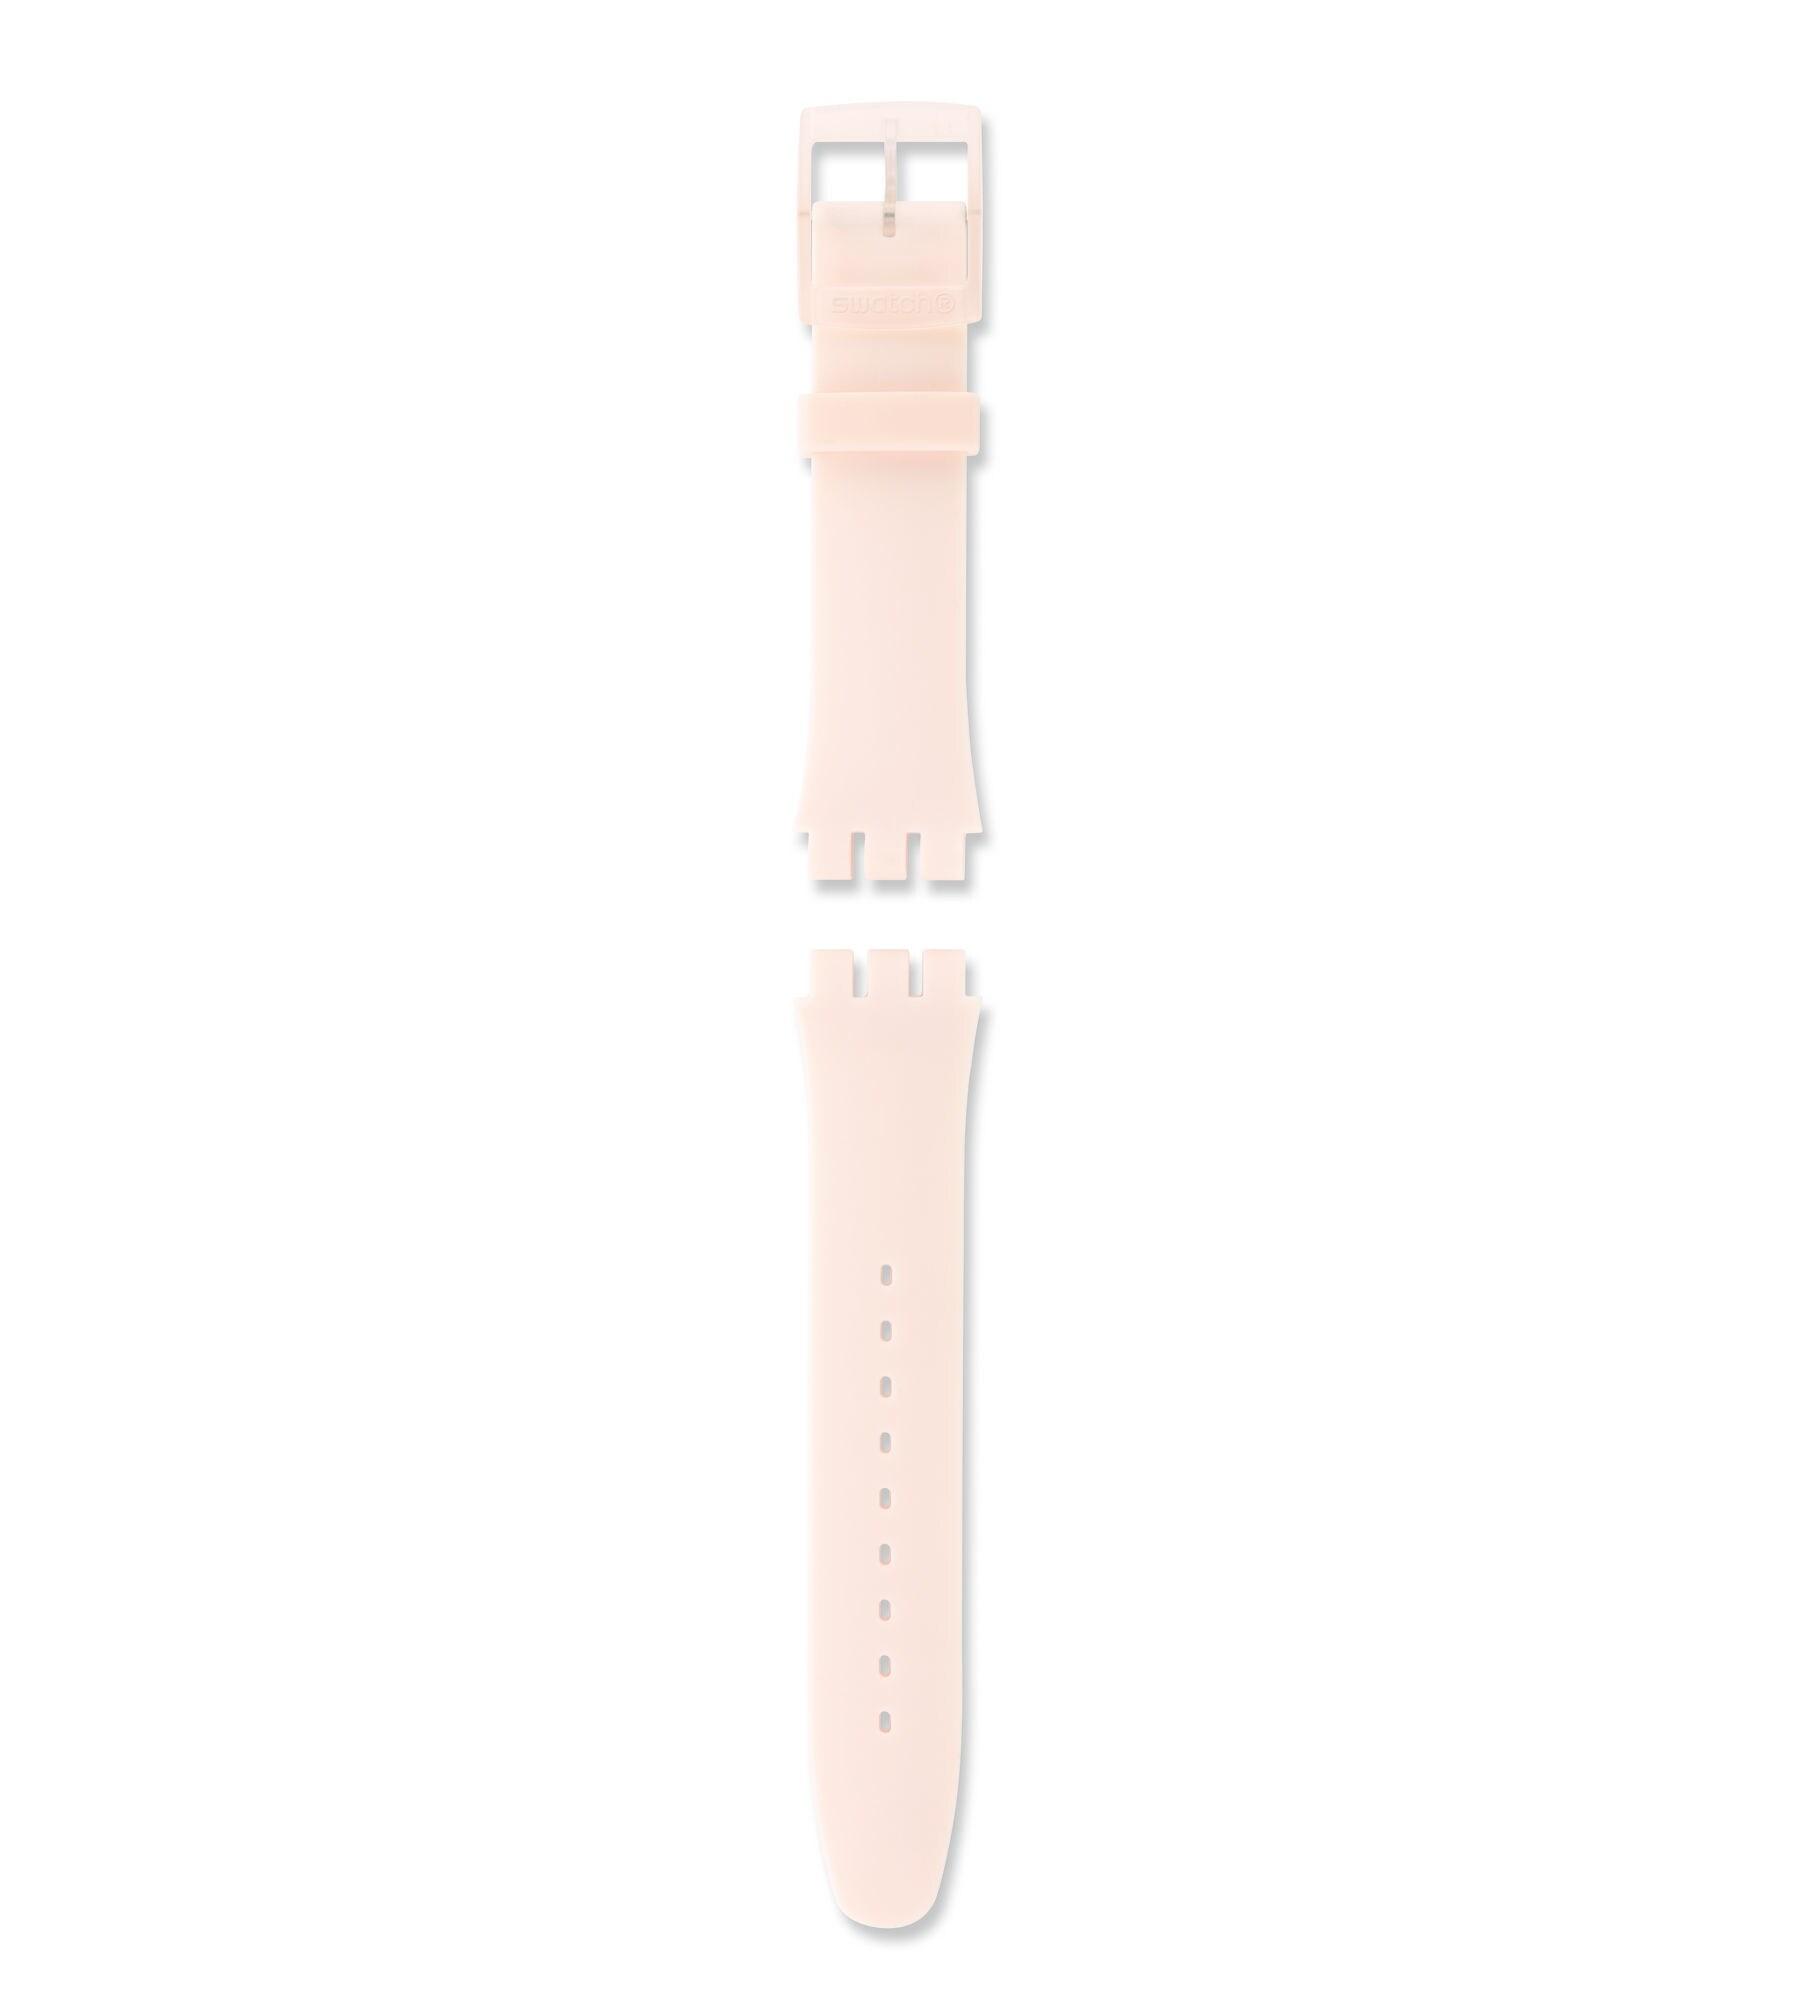 a7bab43b585 Swatch® Portugal - Originals New Gent ROSE REBEL   SILICONE STRAP ...